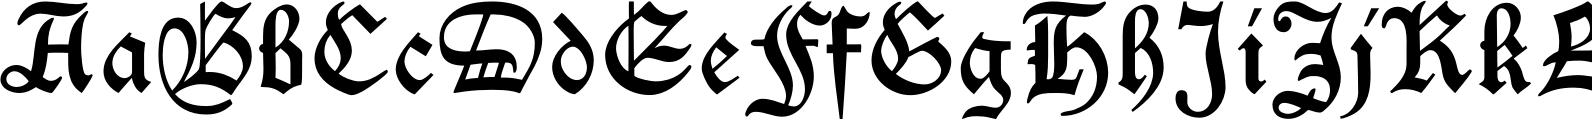 Caxtonian Black